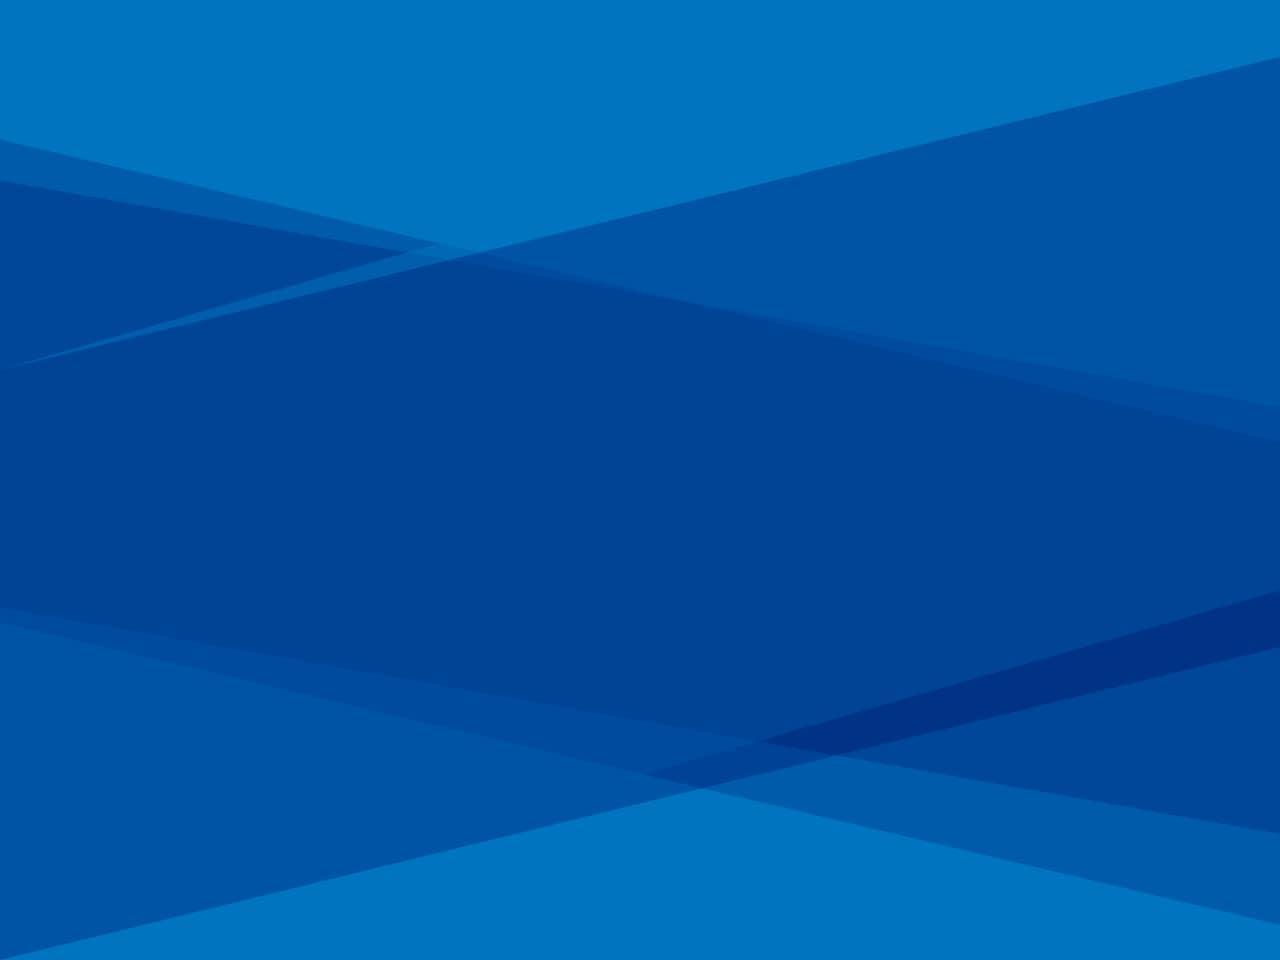 Diagonal screens texture cobalt